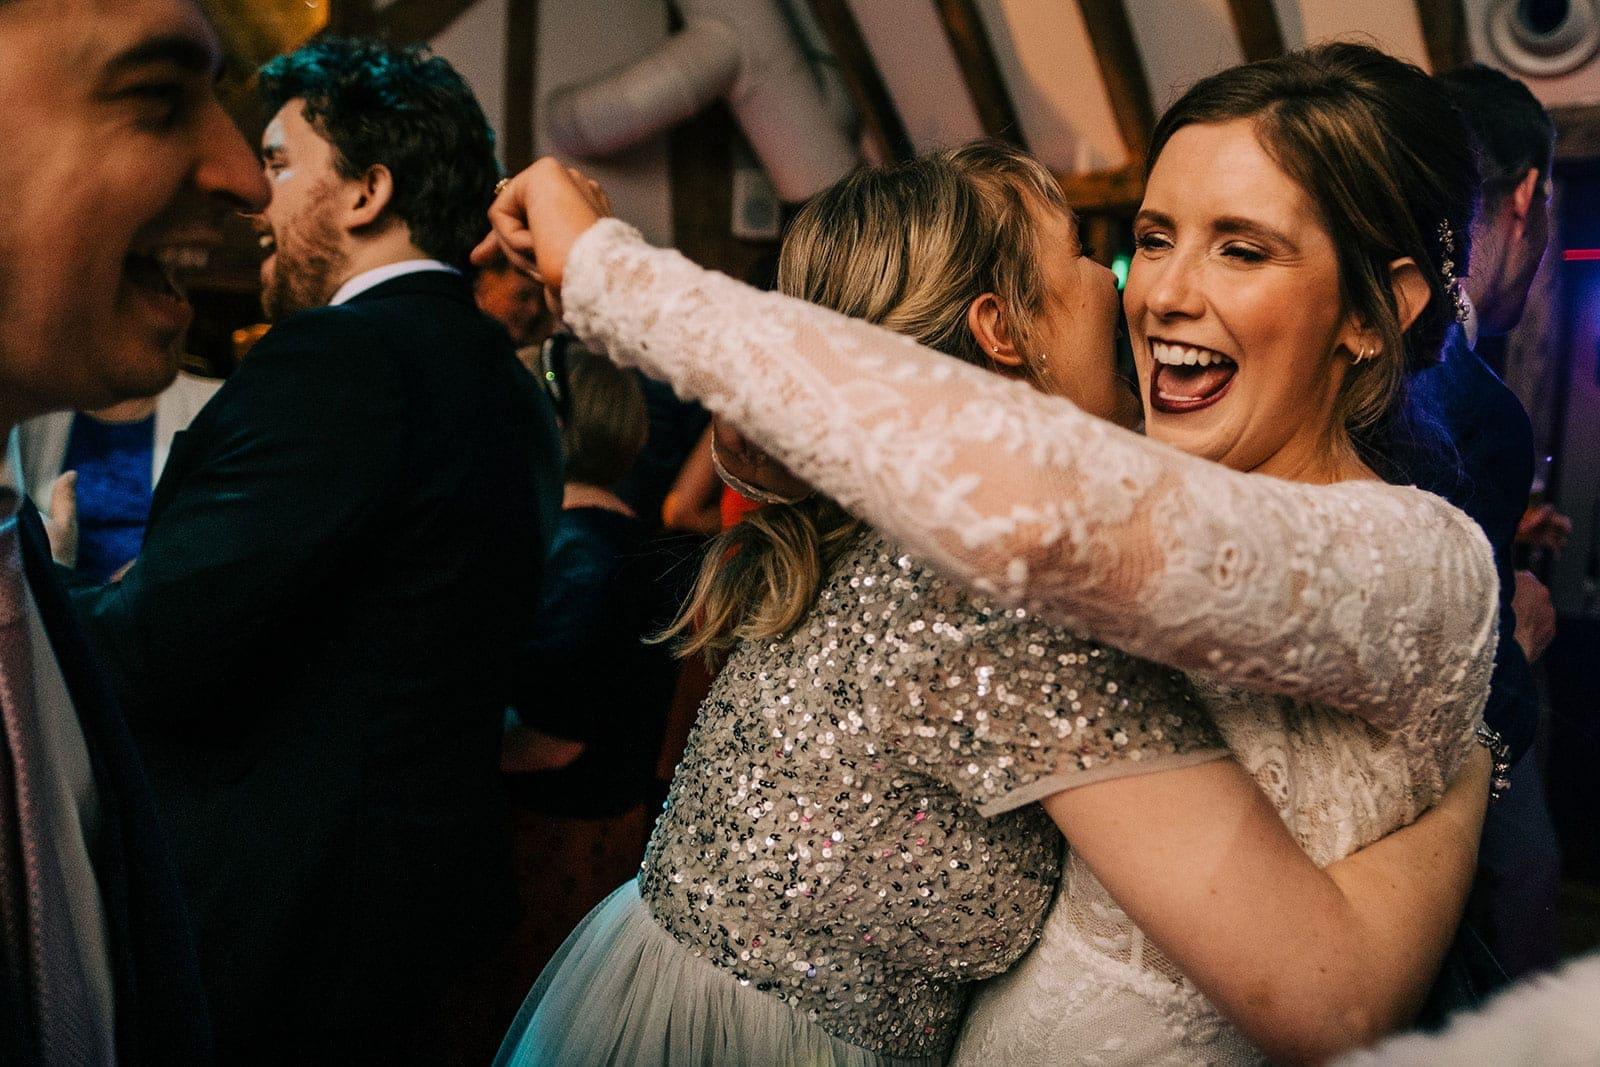 Louise parties on the dance floor